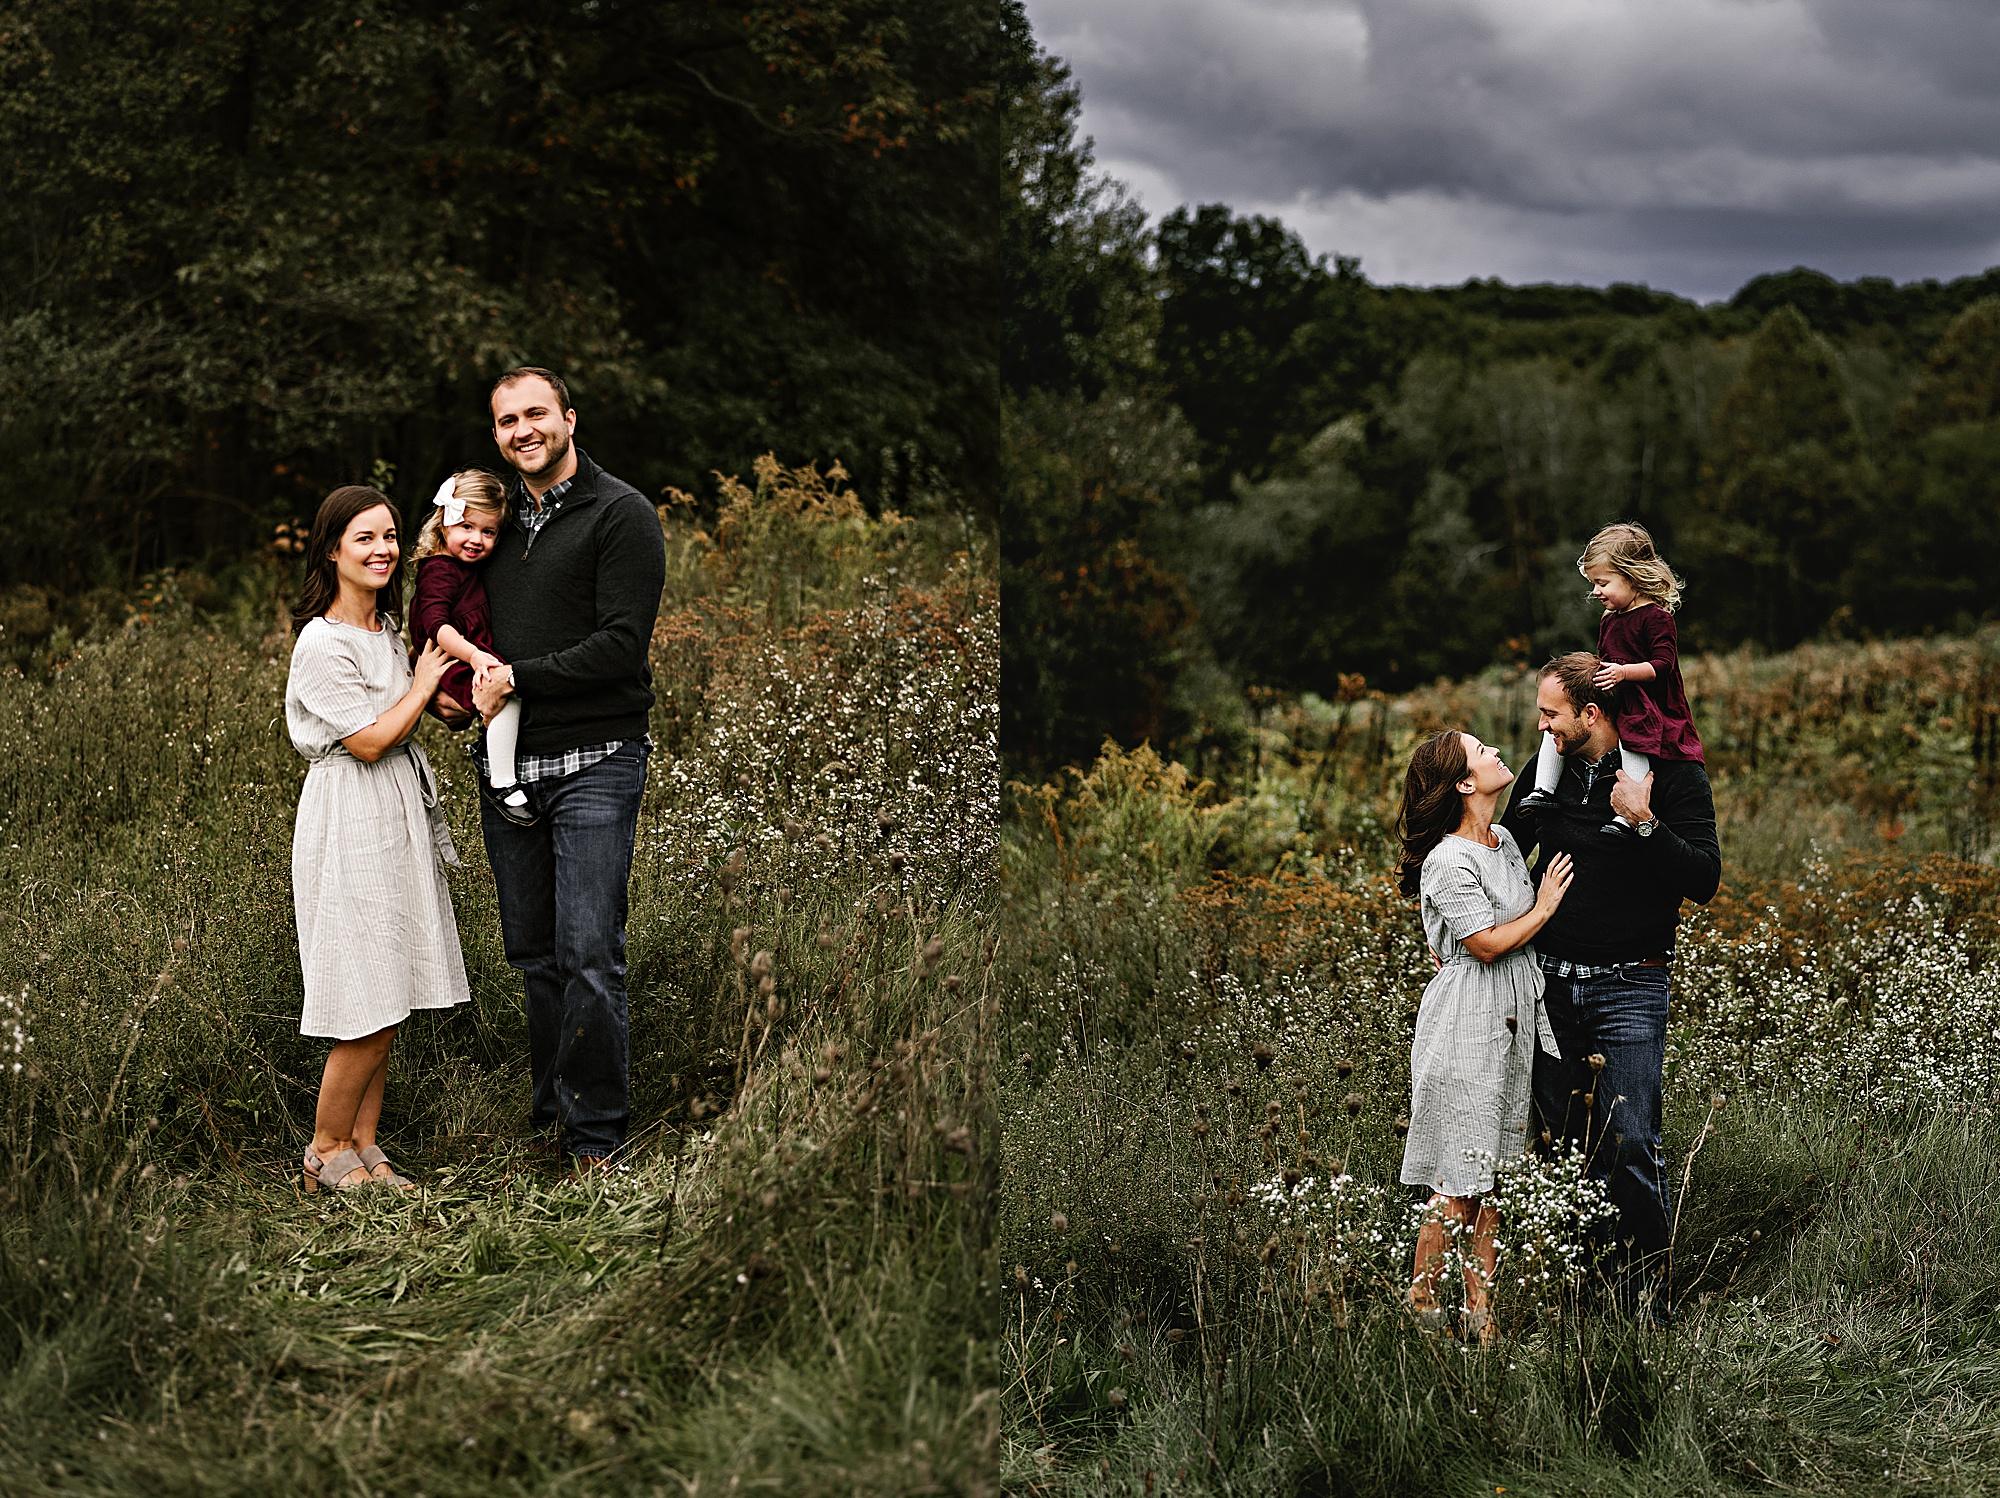 lauren-grayson-photography-akron-ohio-maternity-session-fall-hammer_0038.jpg